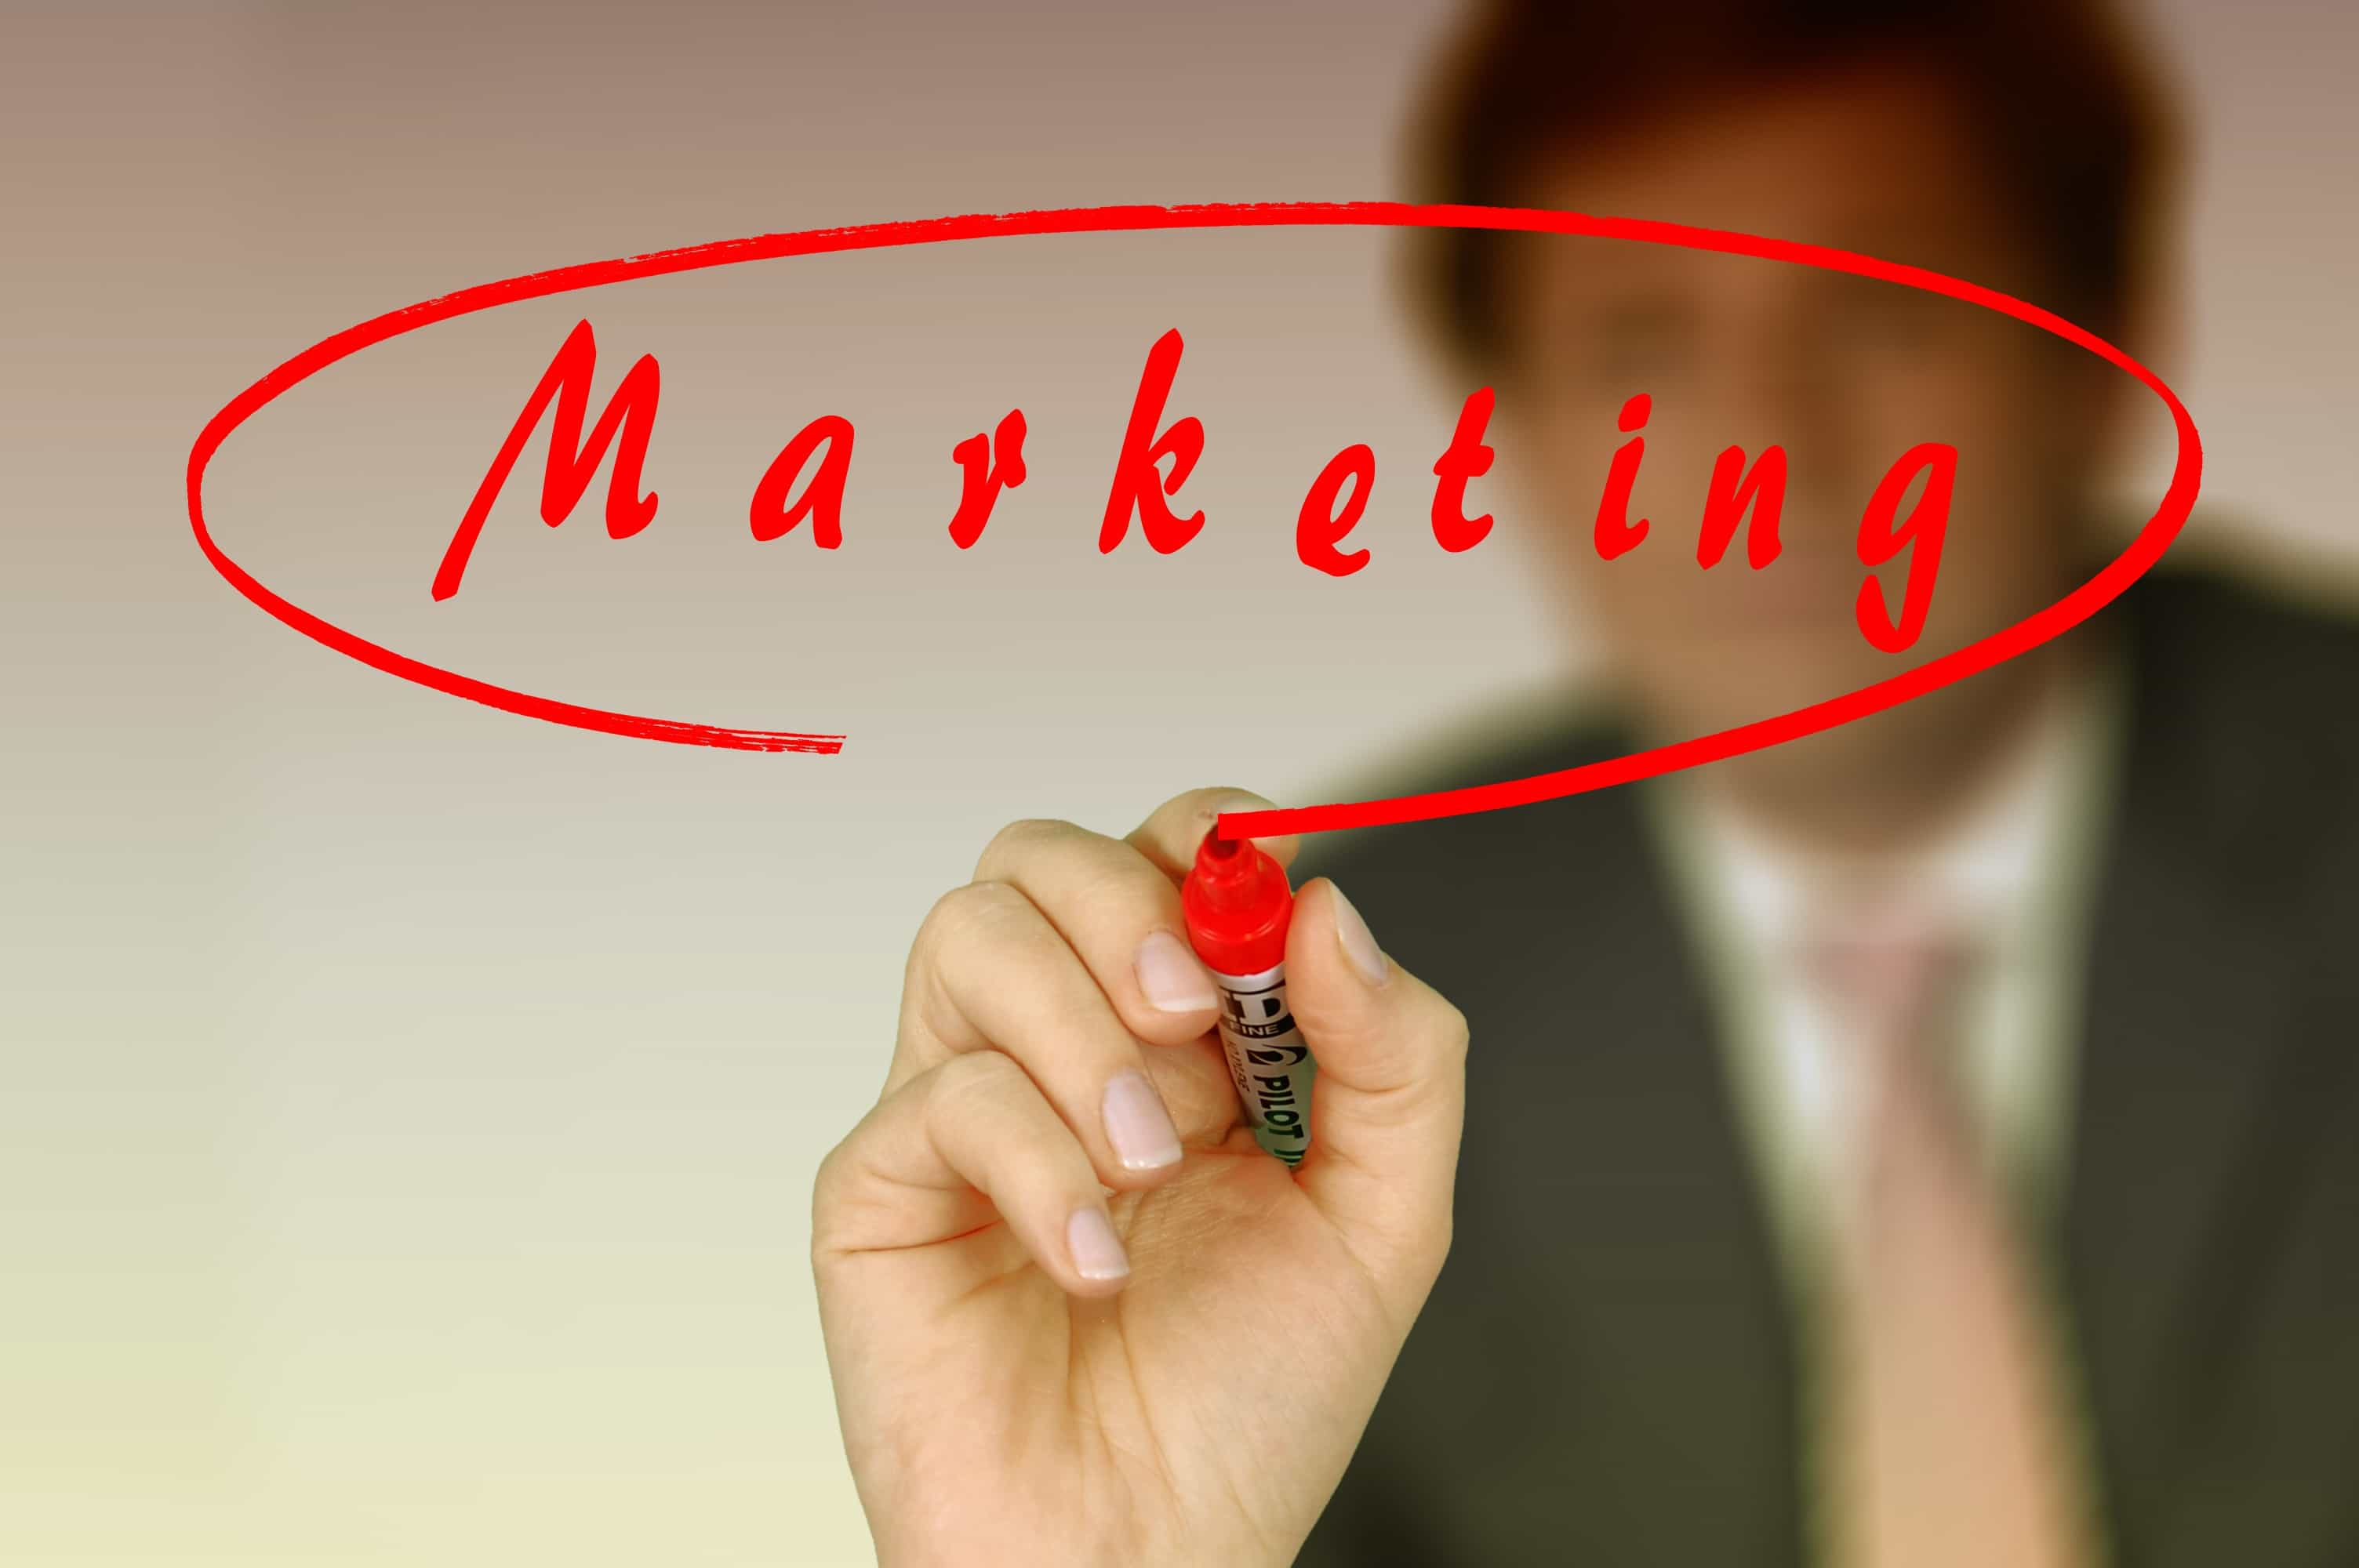 Escritor profesional ¿Cómo atraer buenos clientes?